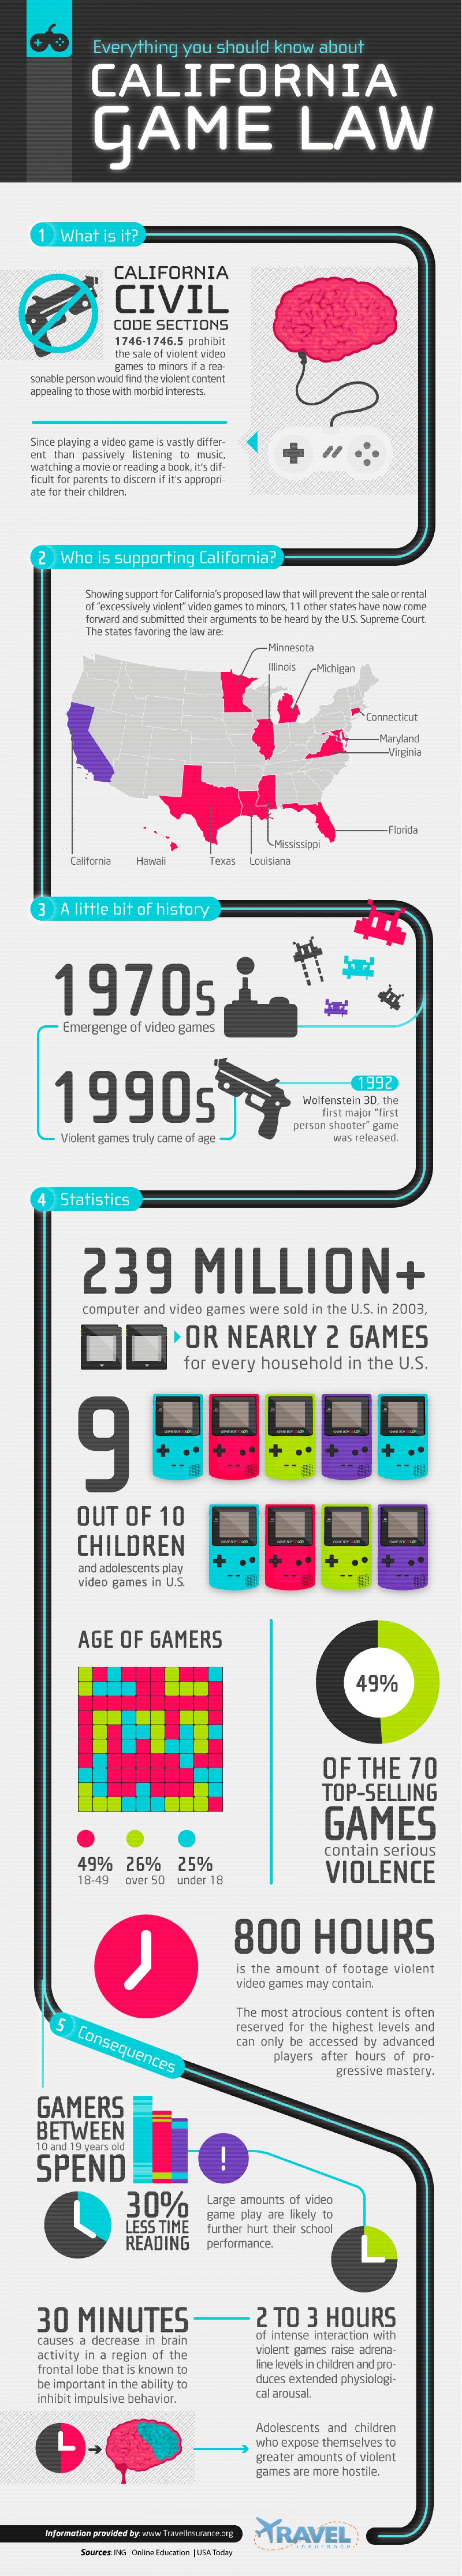 5. California Video Game Laws